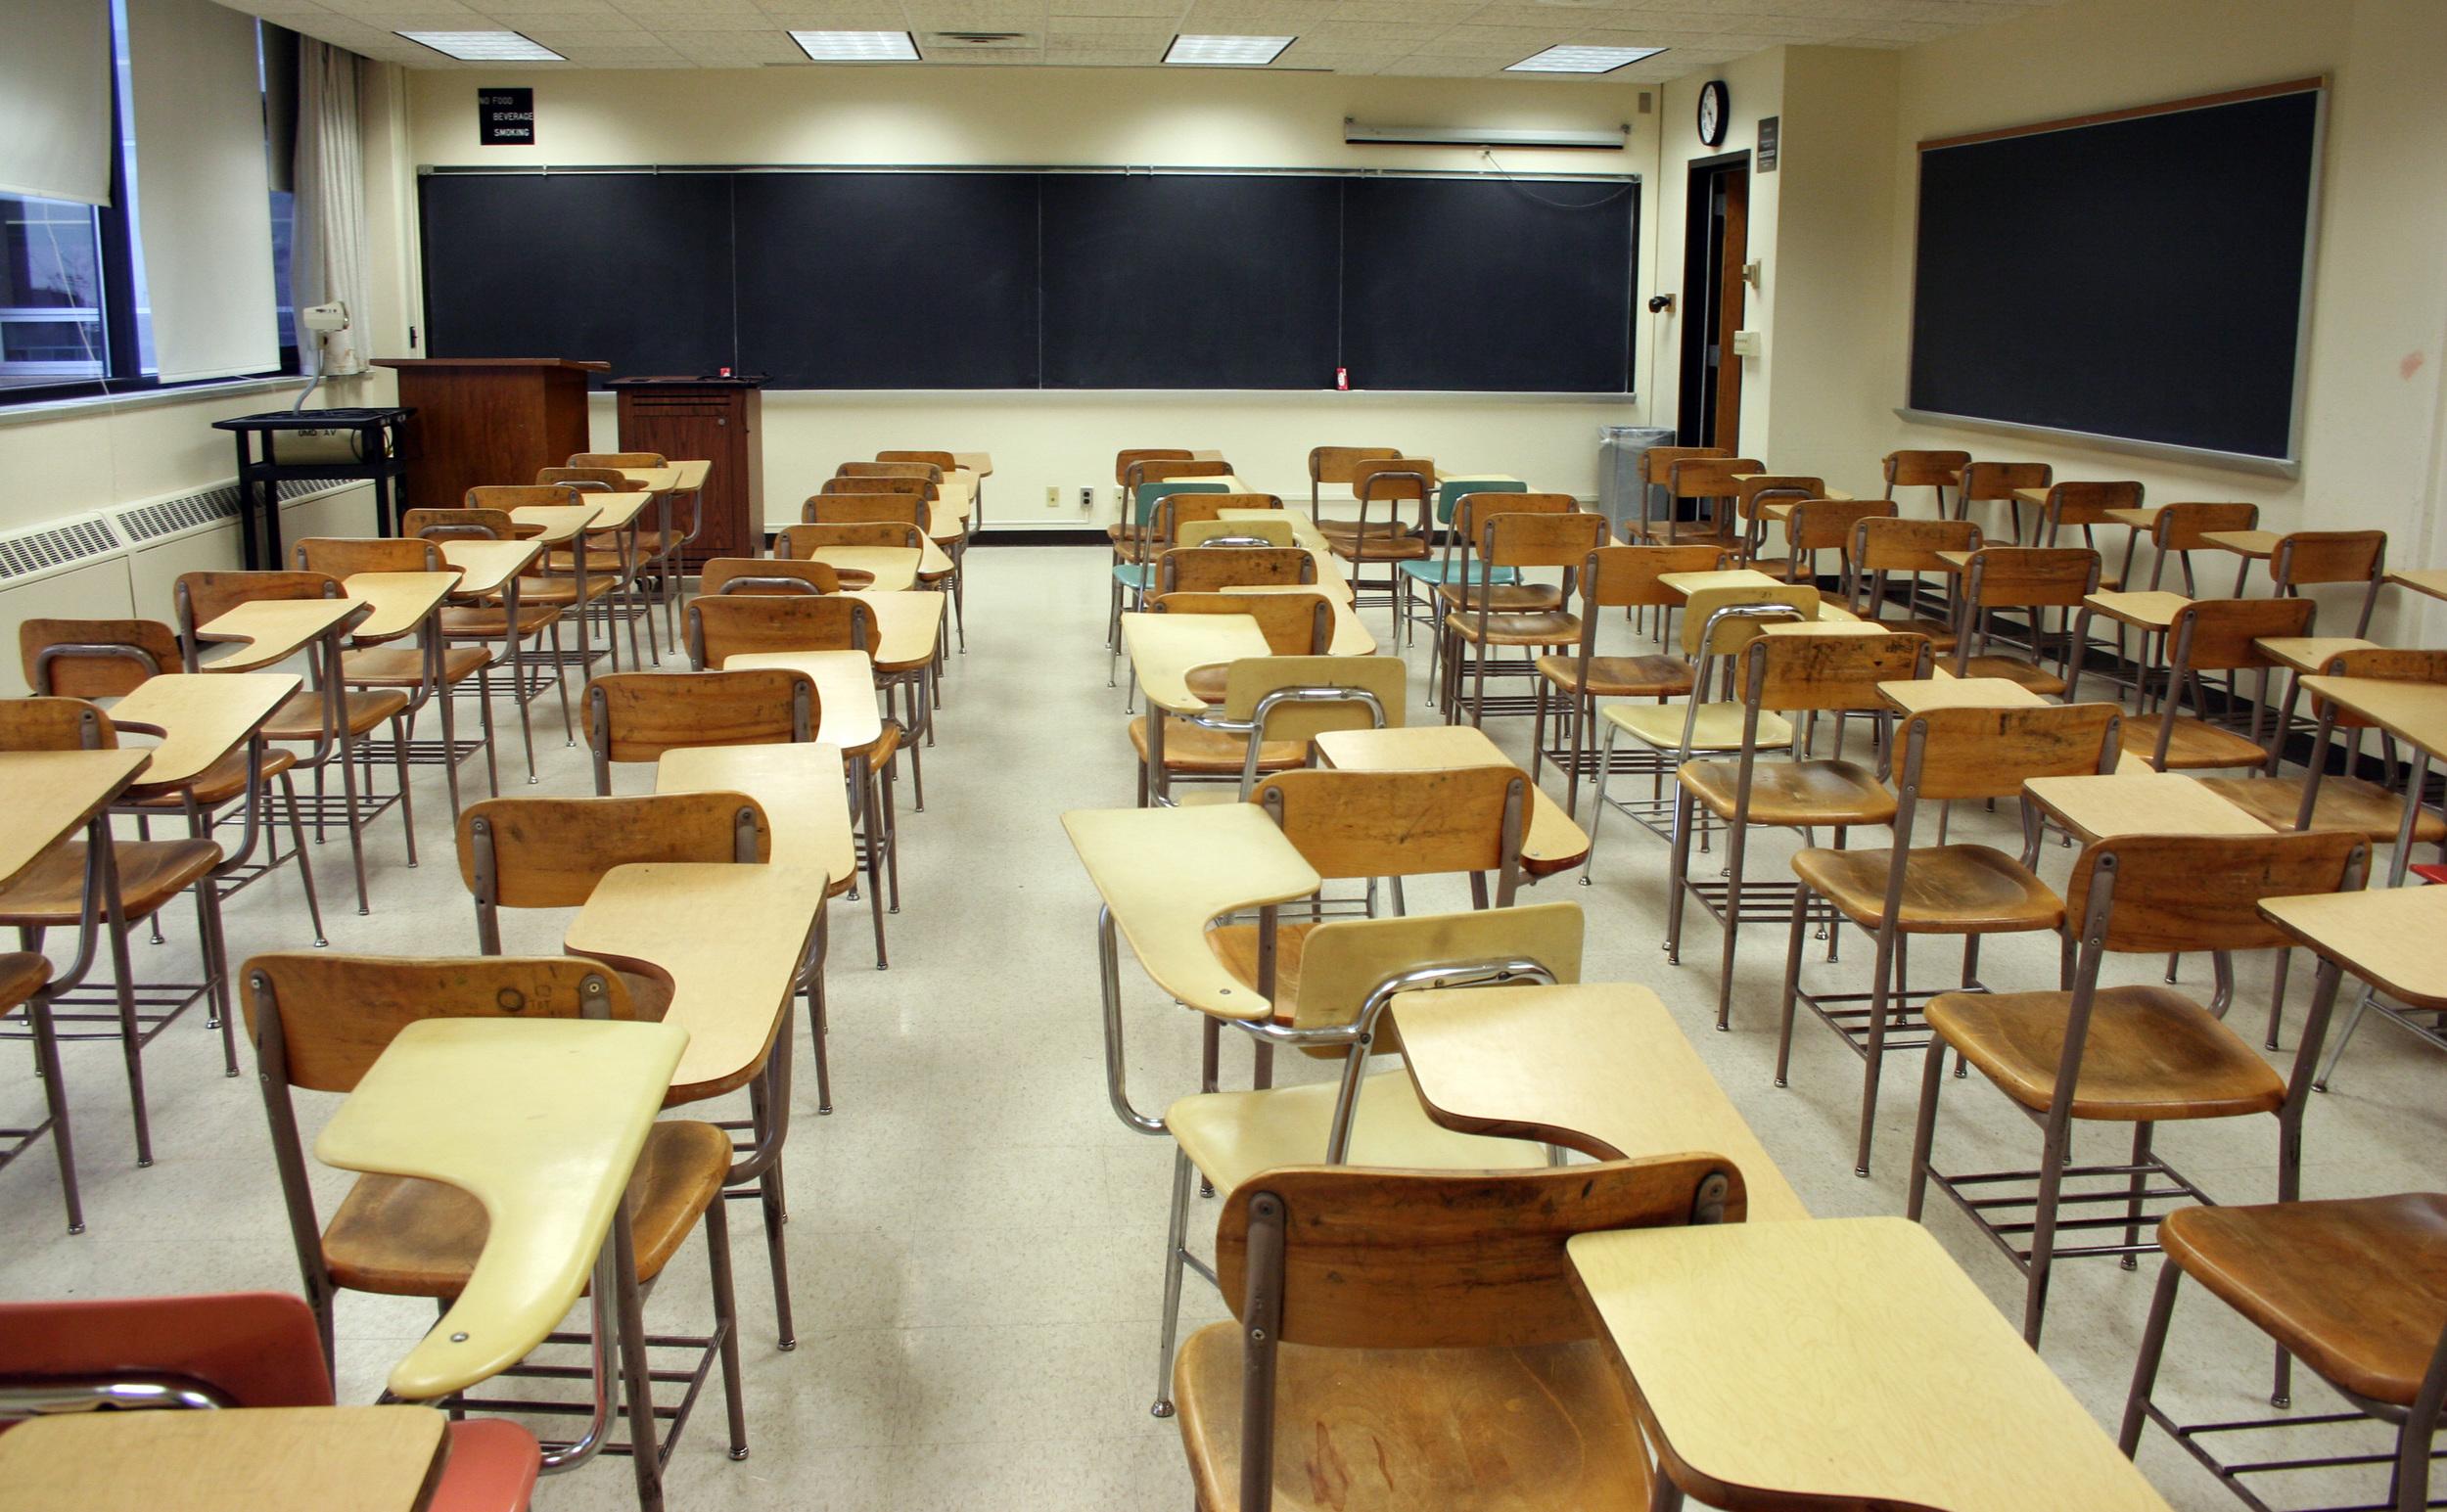 rows of desks-back to school.jpg